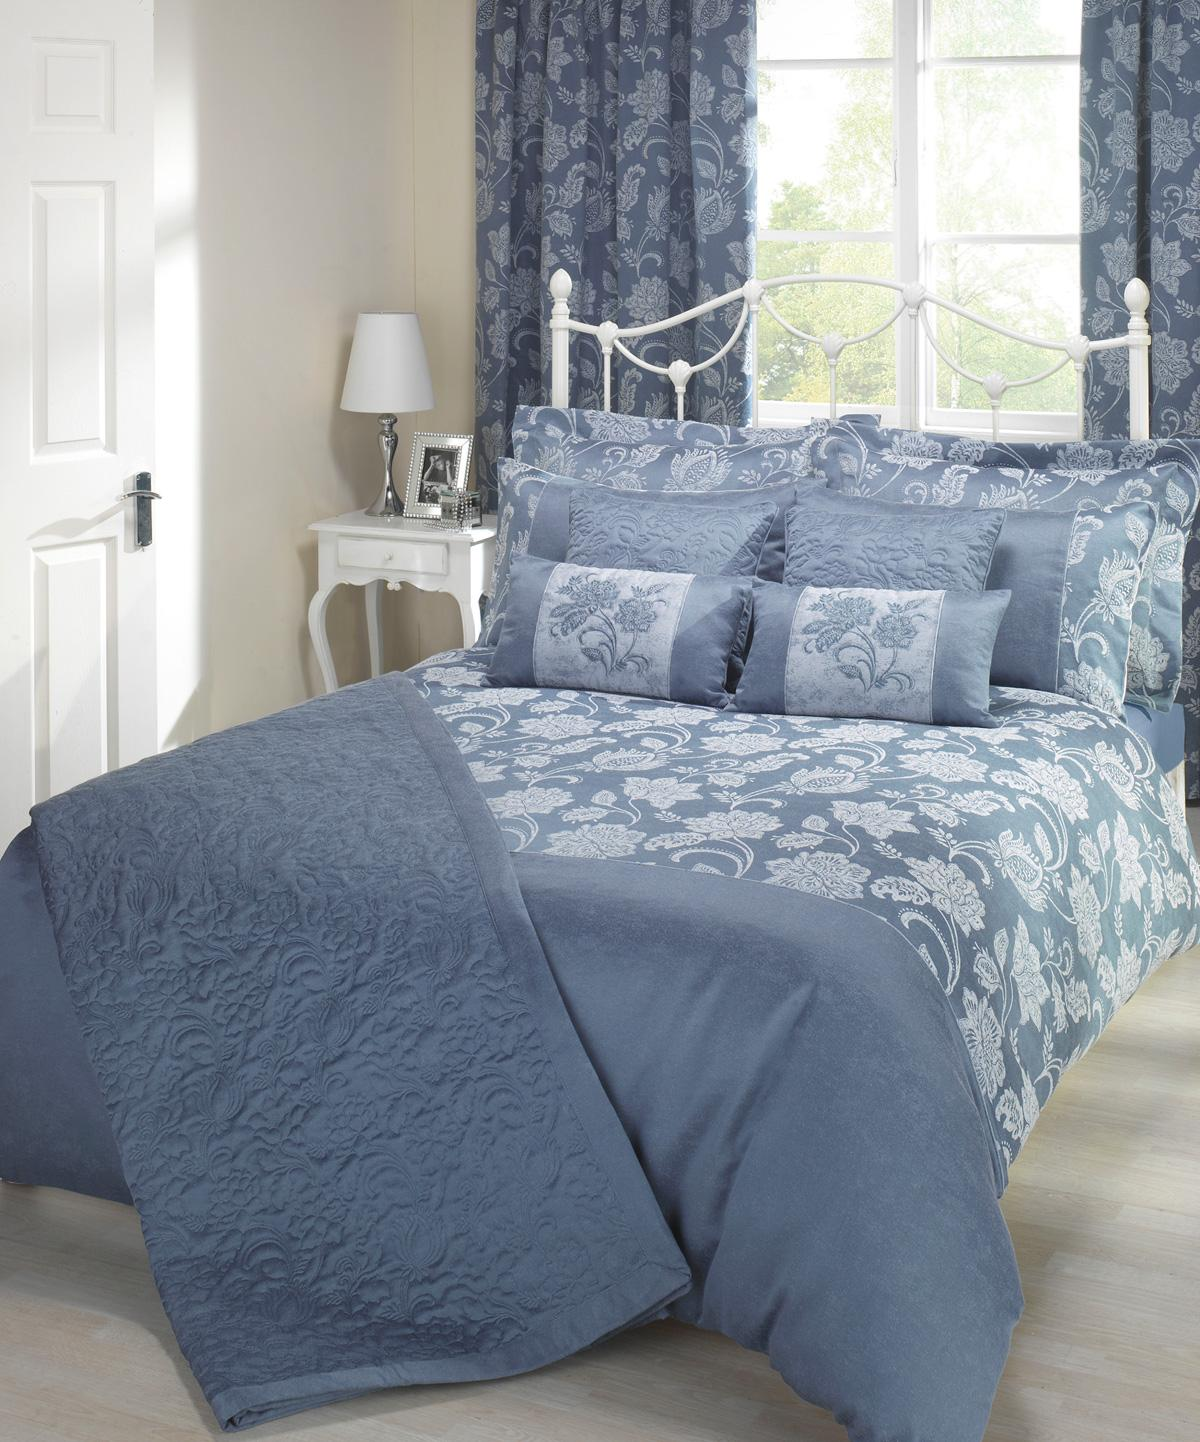 Blue Portofino Luxury Bedding by Julian Charles